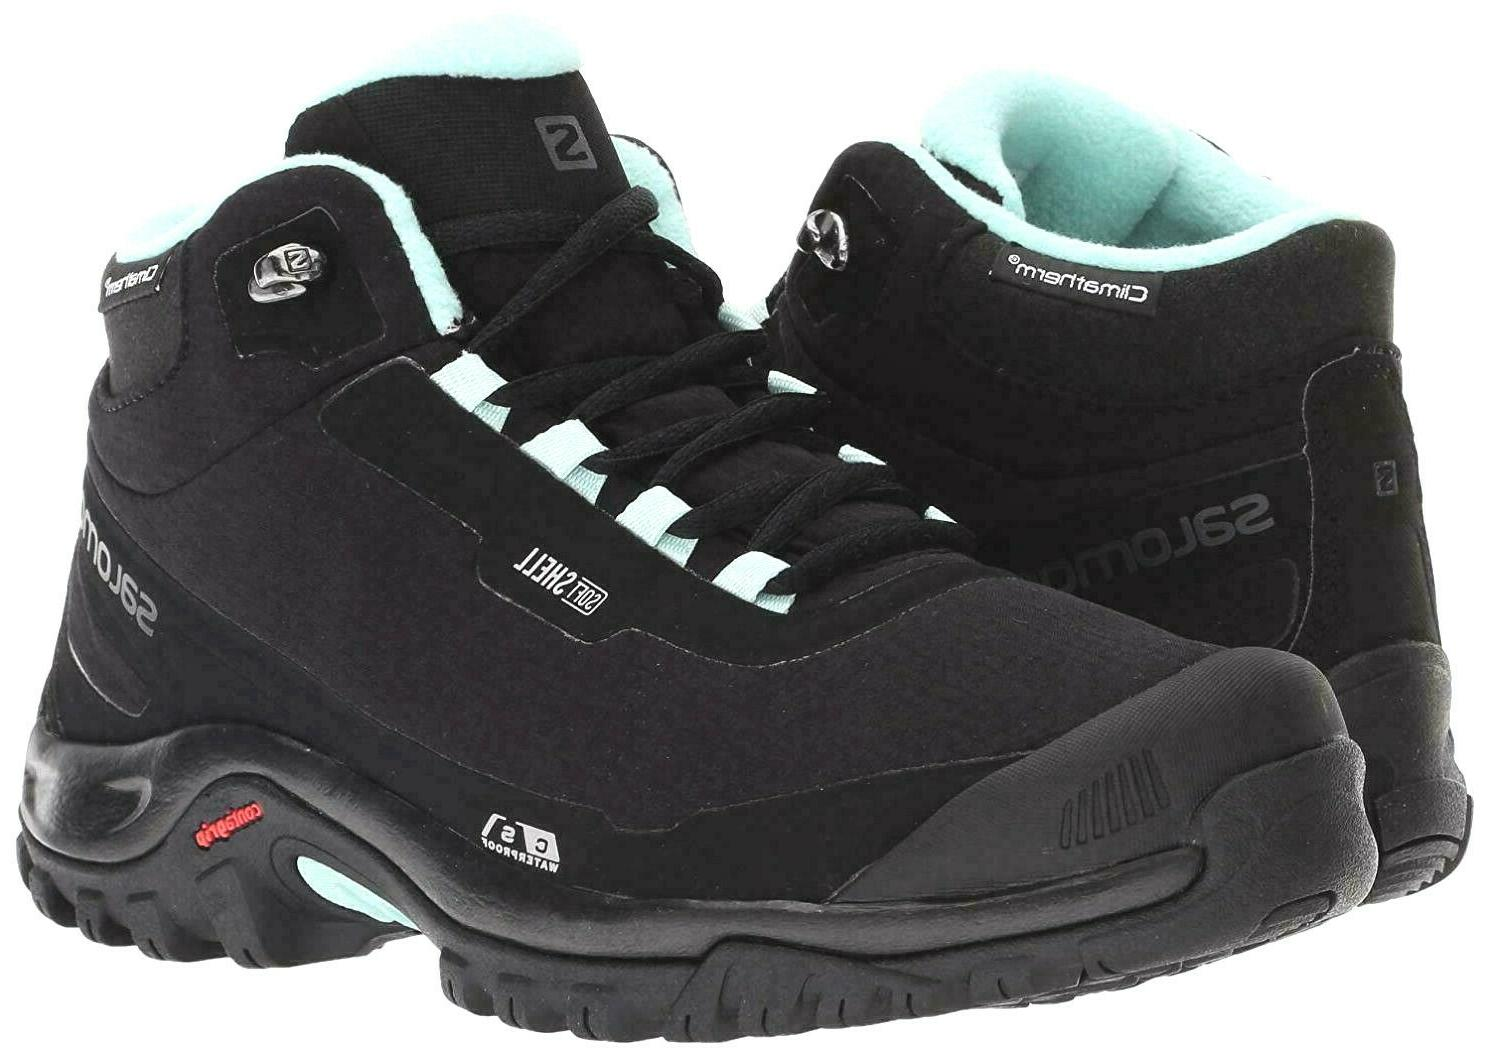 New Salomon Women/'s Shelter CS WP Waterproof Hiking Boots Size 10 Black # 376873